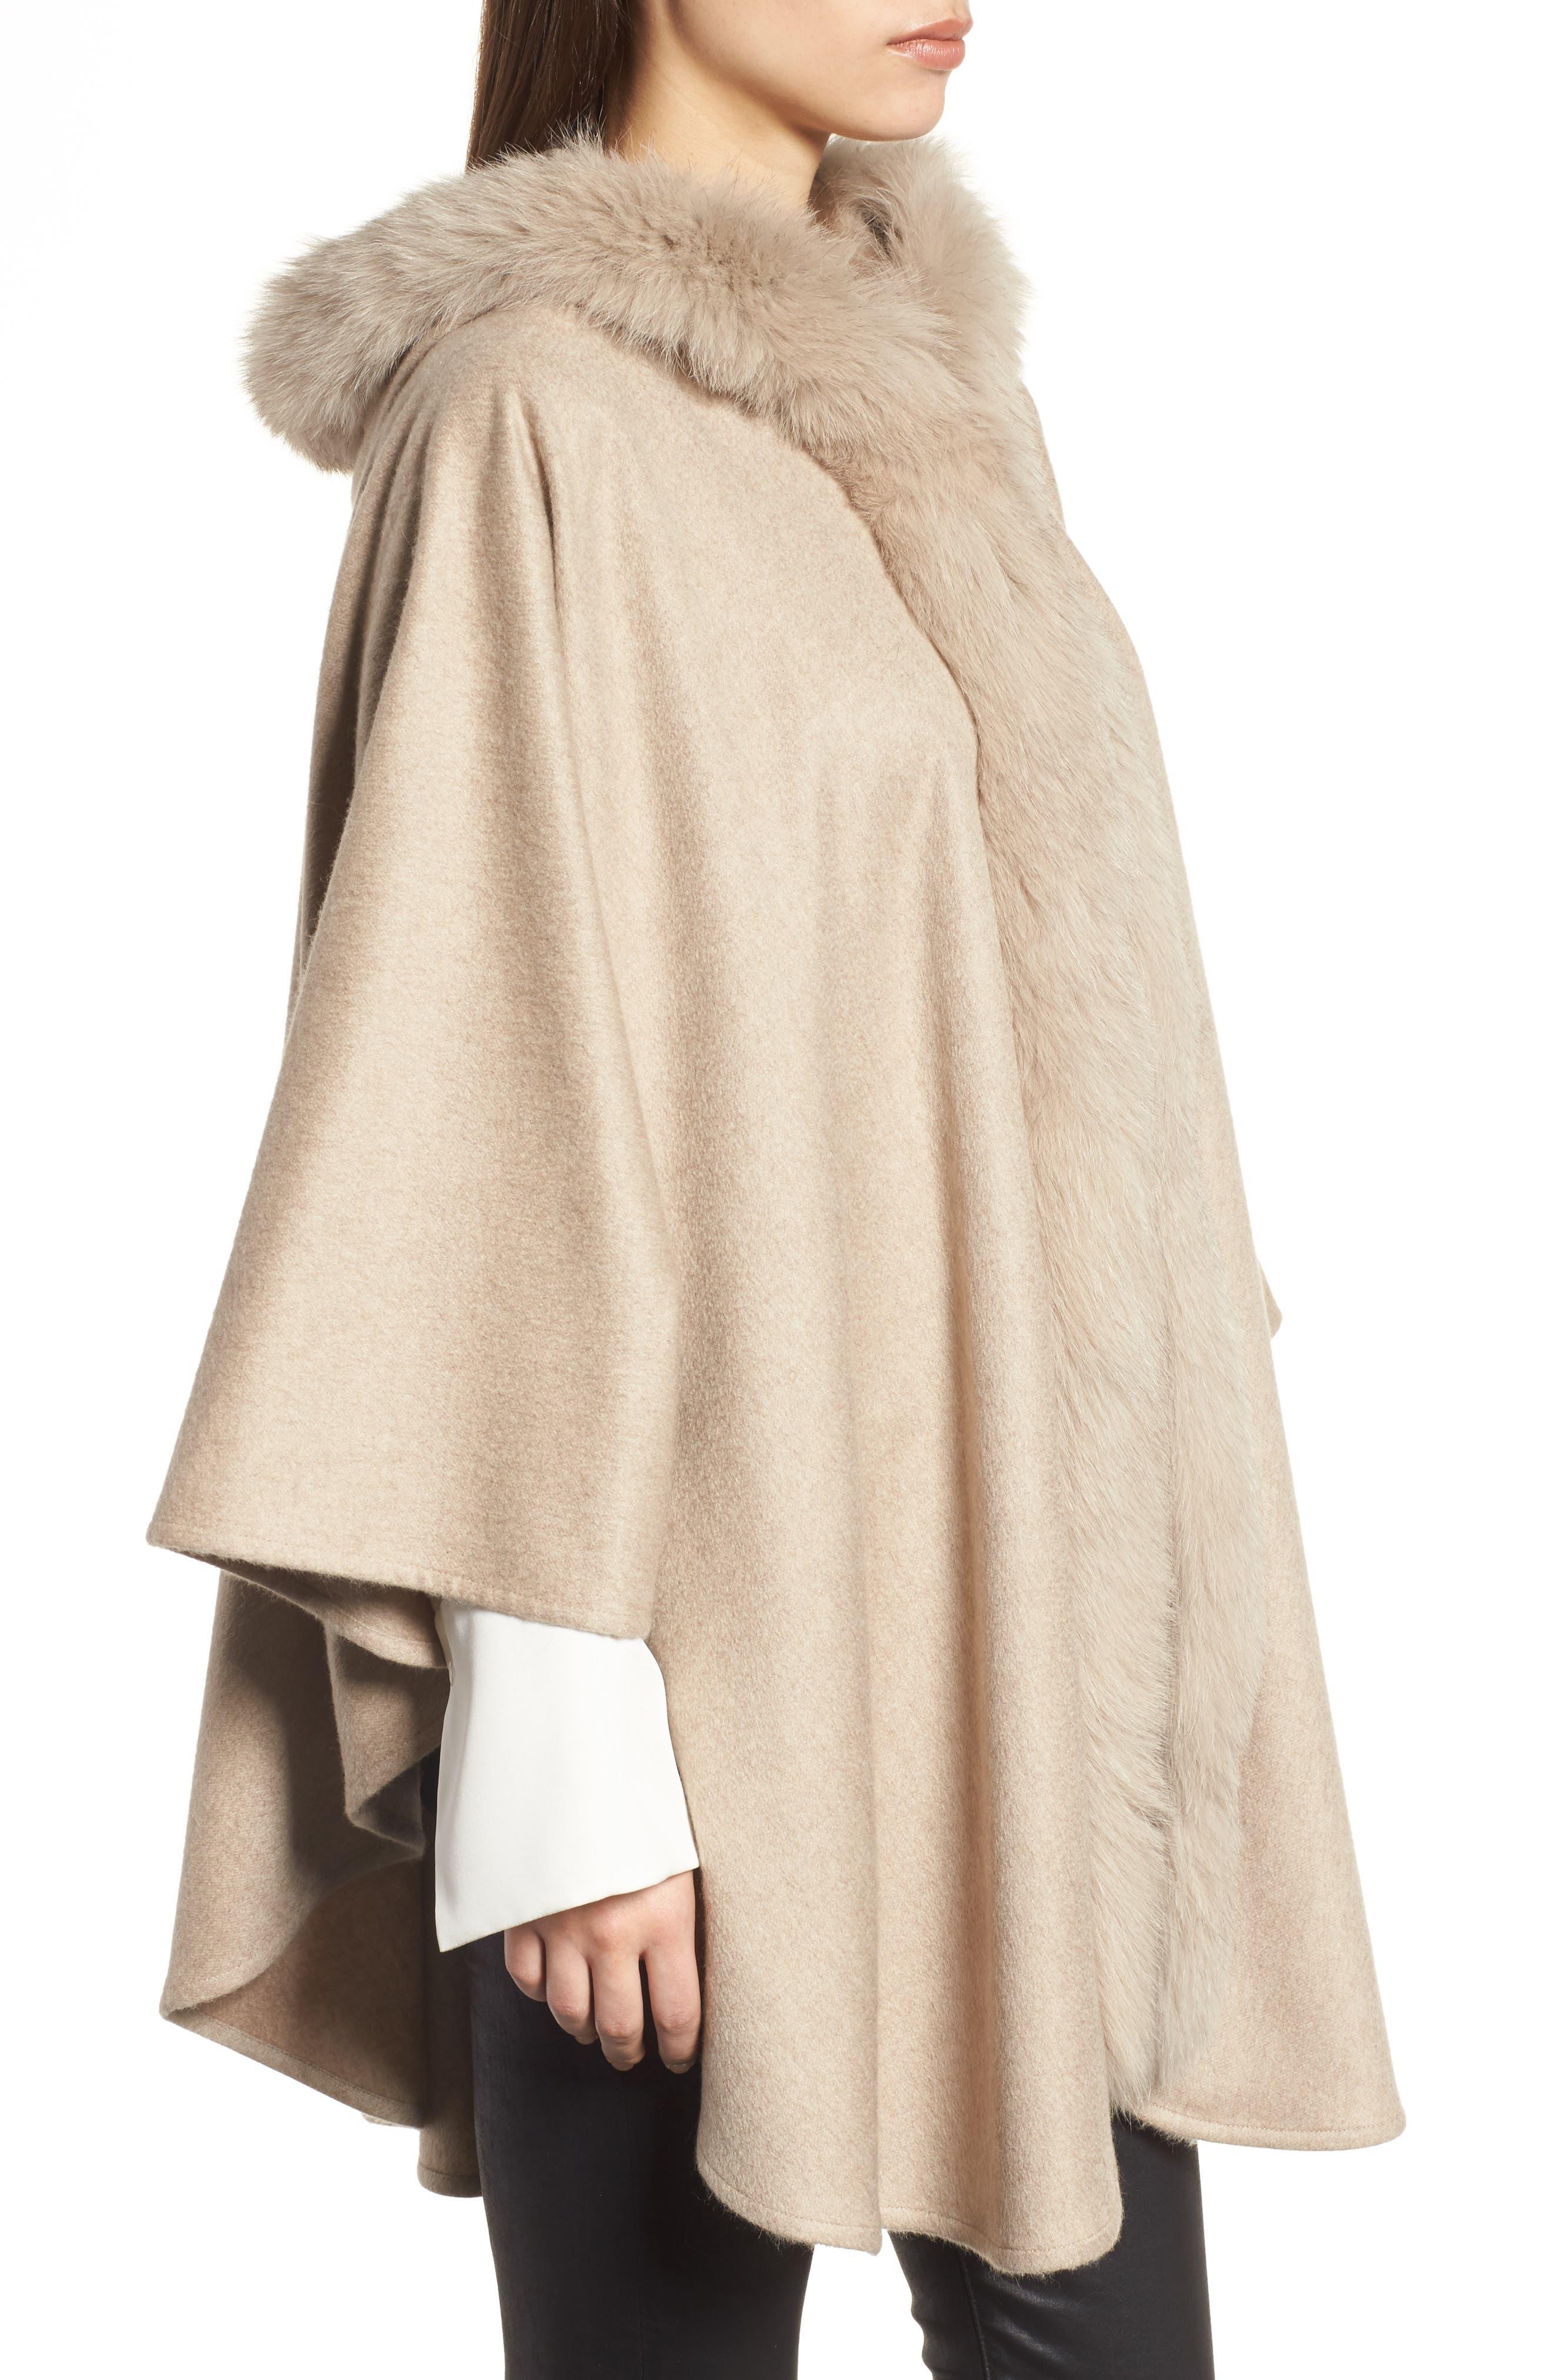 Alternate Image 3  - Max Mara Cashmere Hooded Cape with Genuine Fox Fur Trim